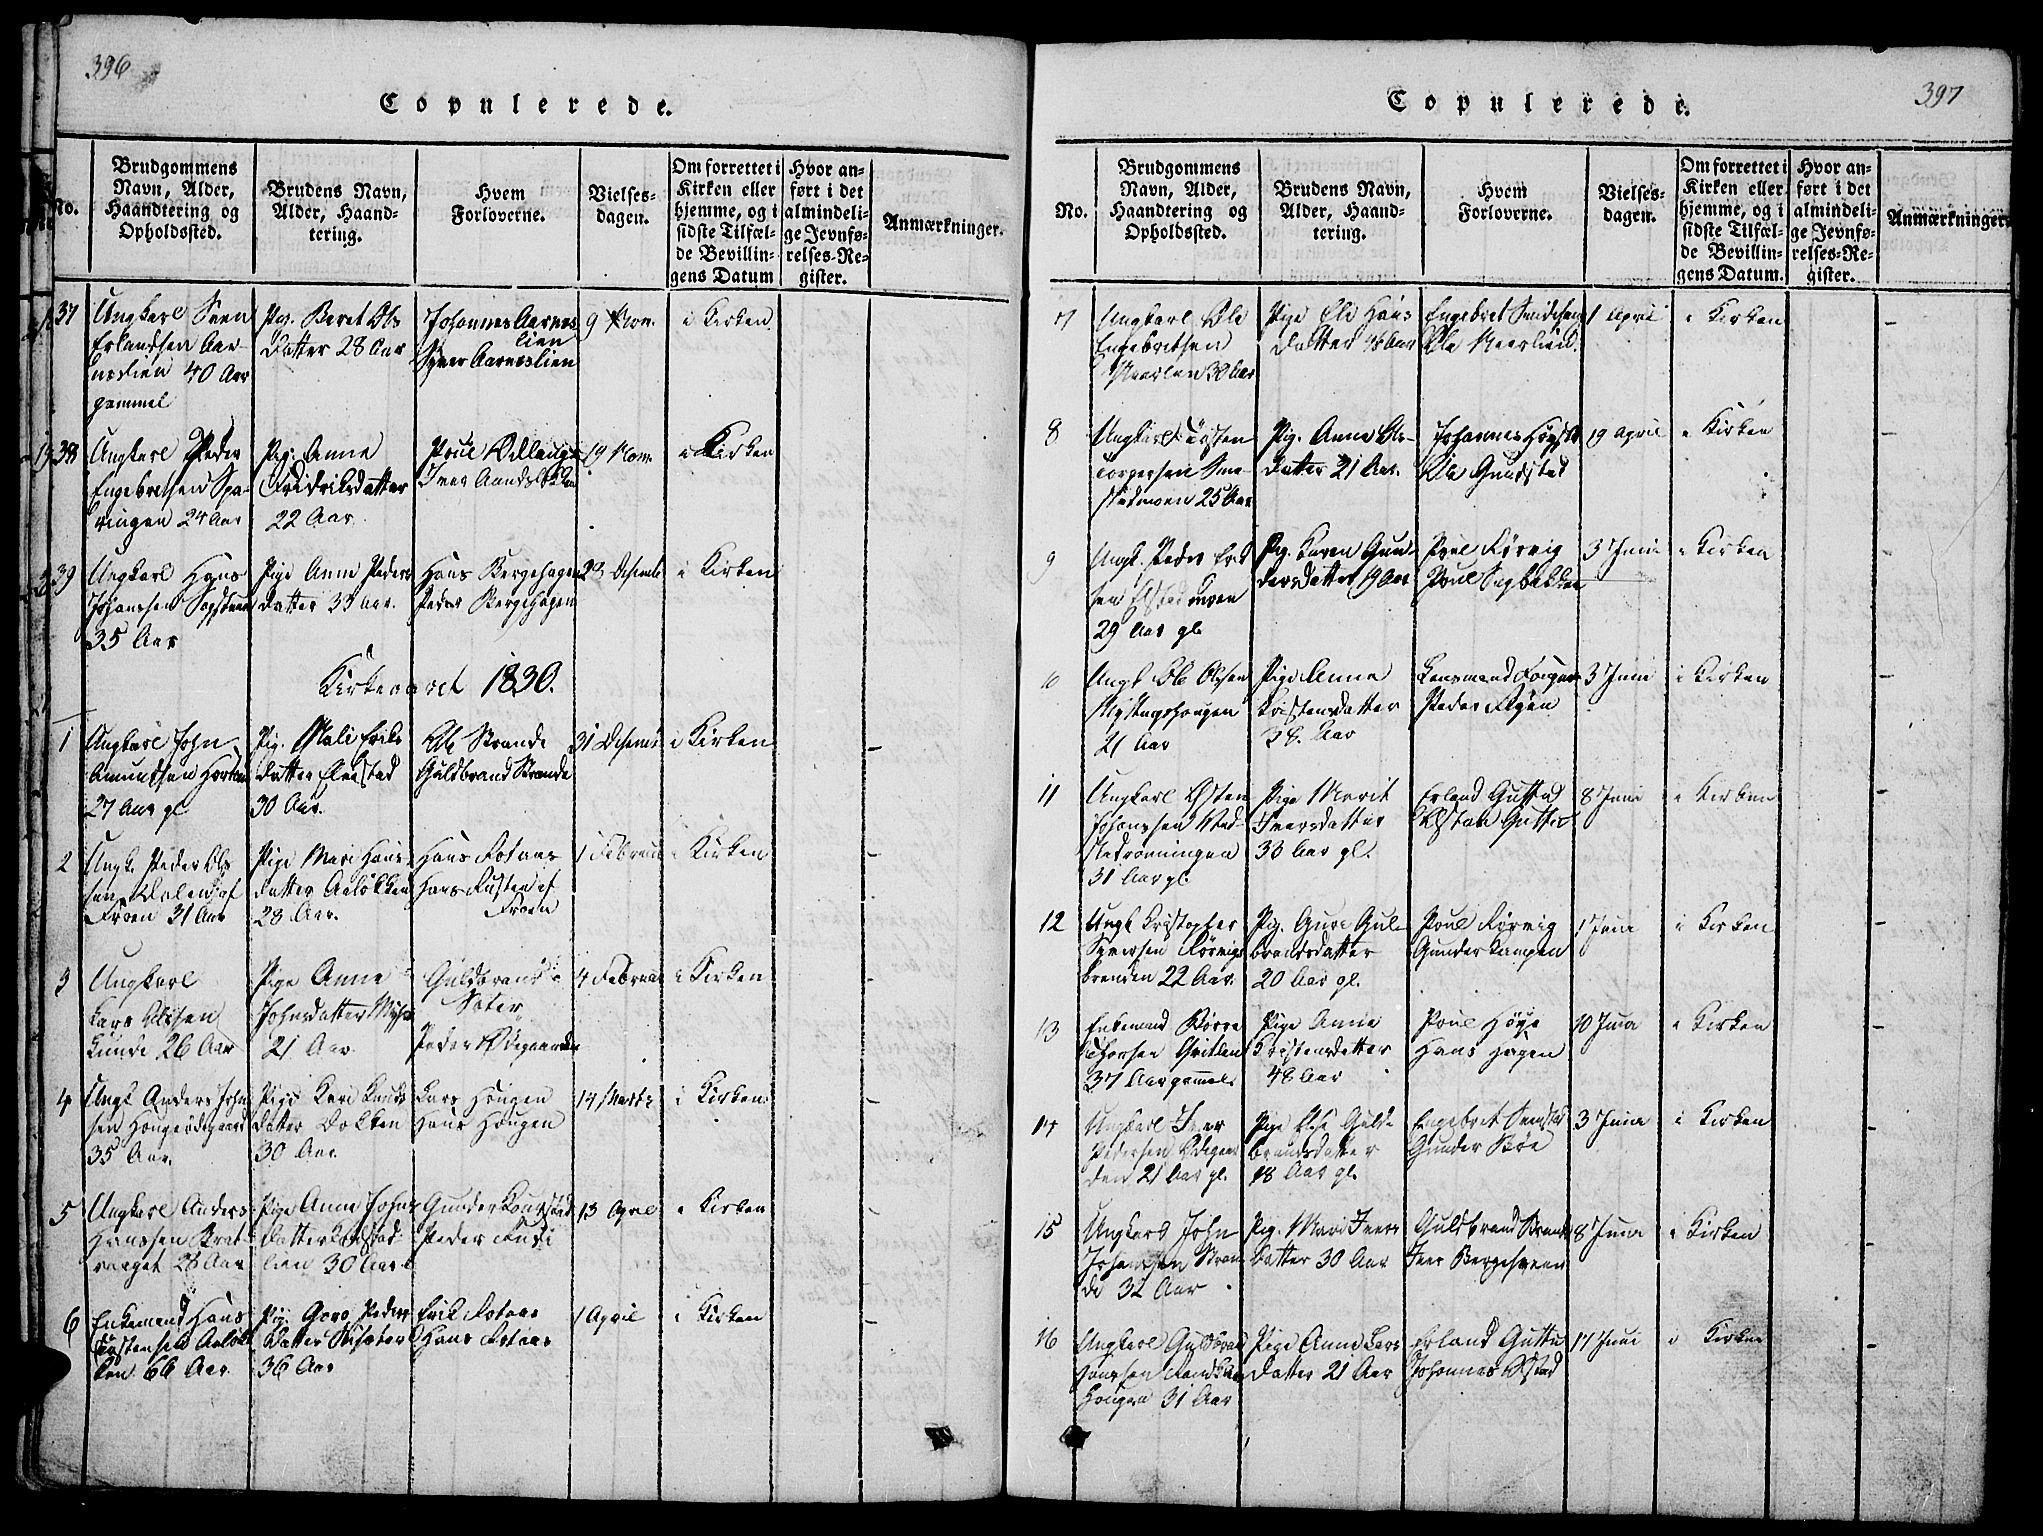 SAH, Ringebu prestekontor, Klokkerbok nr. 1, 1821-1839, s. 396-397